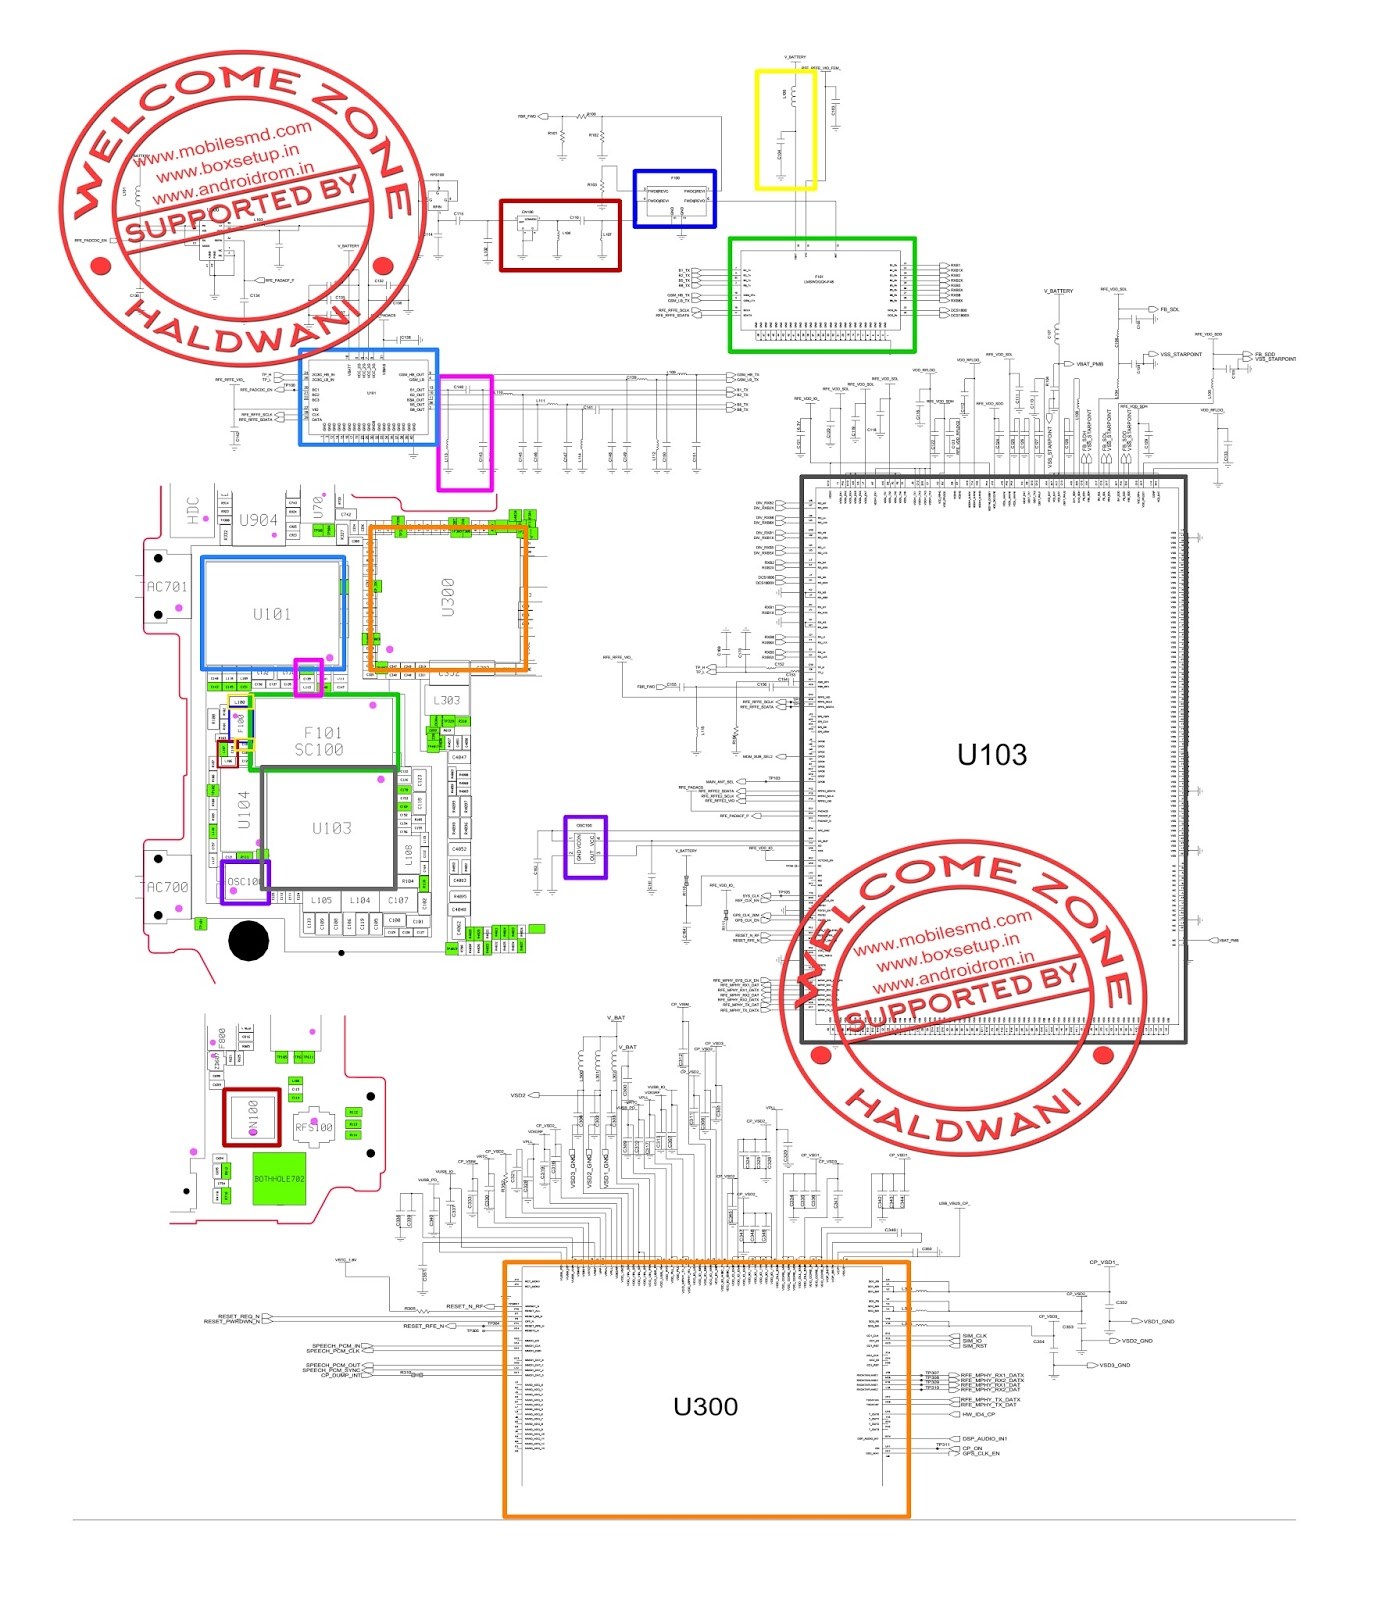 emg hsh wiring diagram otax vlx91 for hsh pick up diagram single coil pickup wiring diagram hsh stratocaster wiring diagram [ 1397 x 1600 Pixel ]